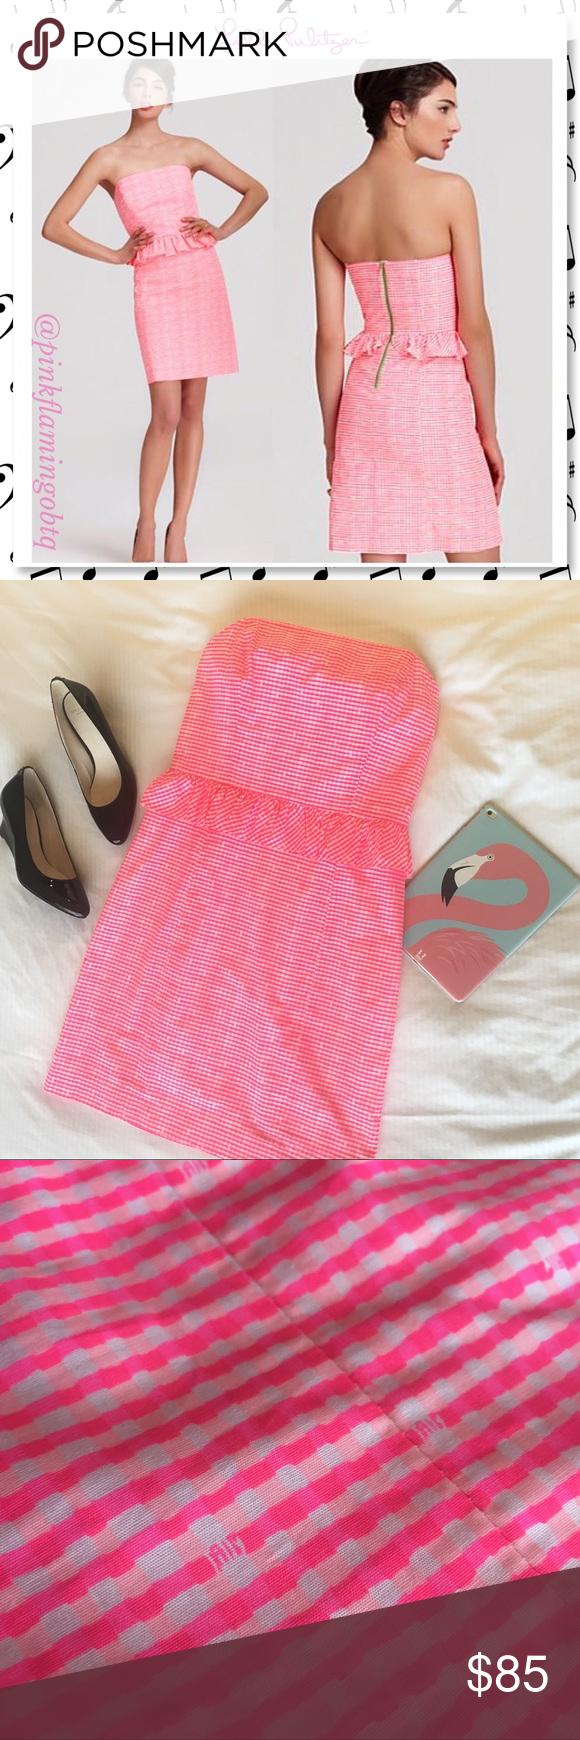 ⬇ $79 Lilly Pulitzer Lowe Dress Fiesta Pink Gingha